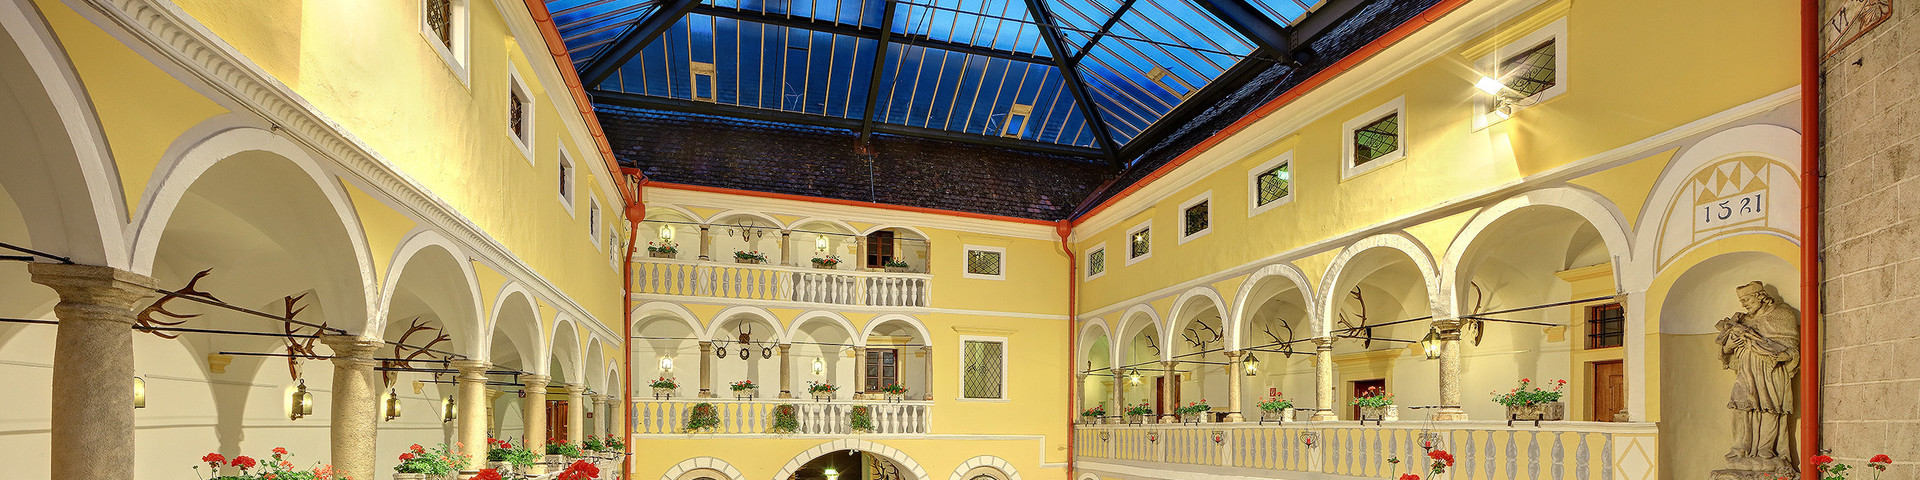 Hotel Schloss Weikersdorft - Arkadenhof neu © Hotel Schloss Weikersdorf